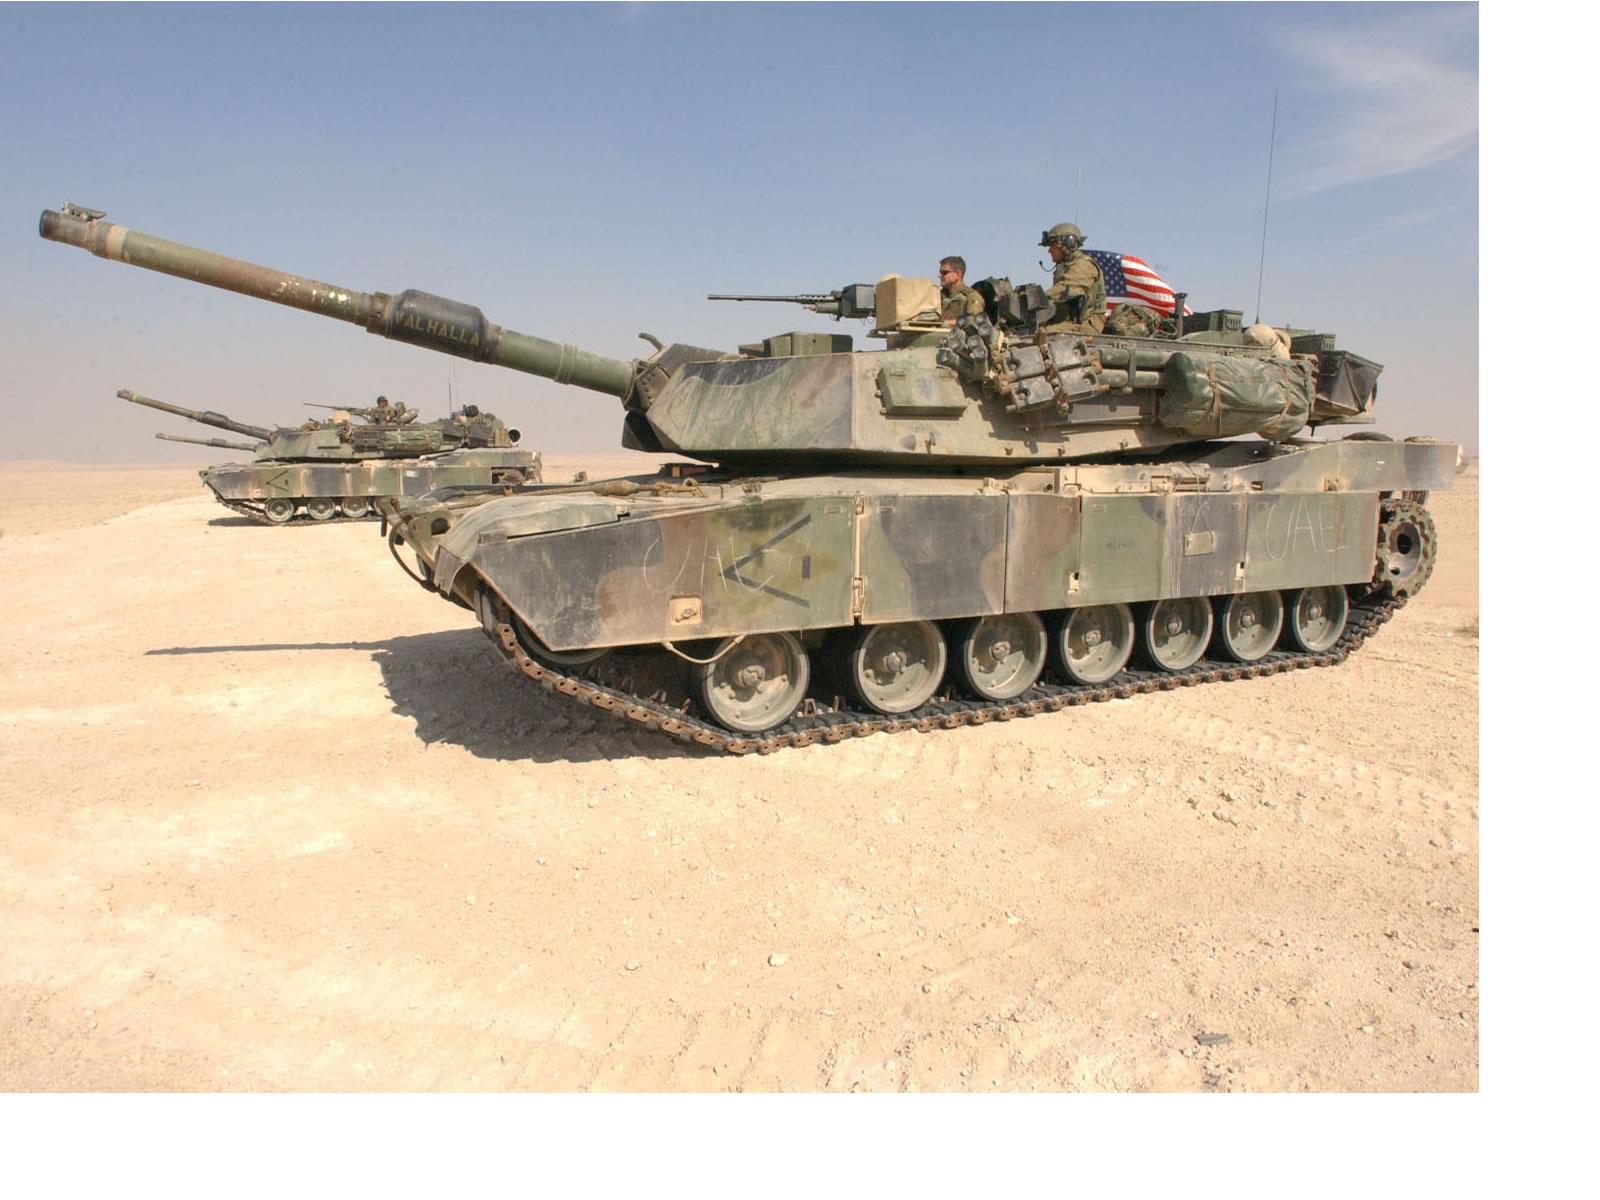 Ancient Mariner Redux: Our Tank: mkmariner.blogspot.com/2012/12/our-tank.html